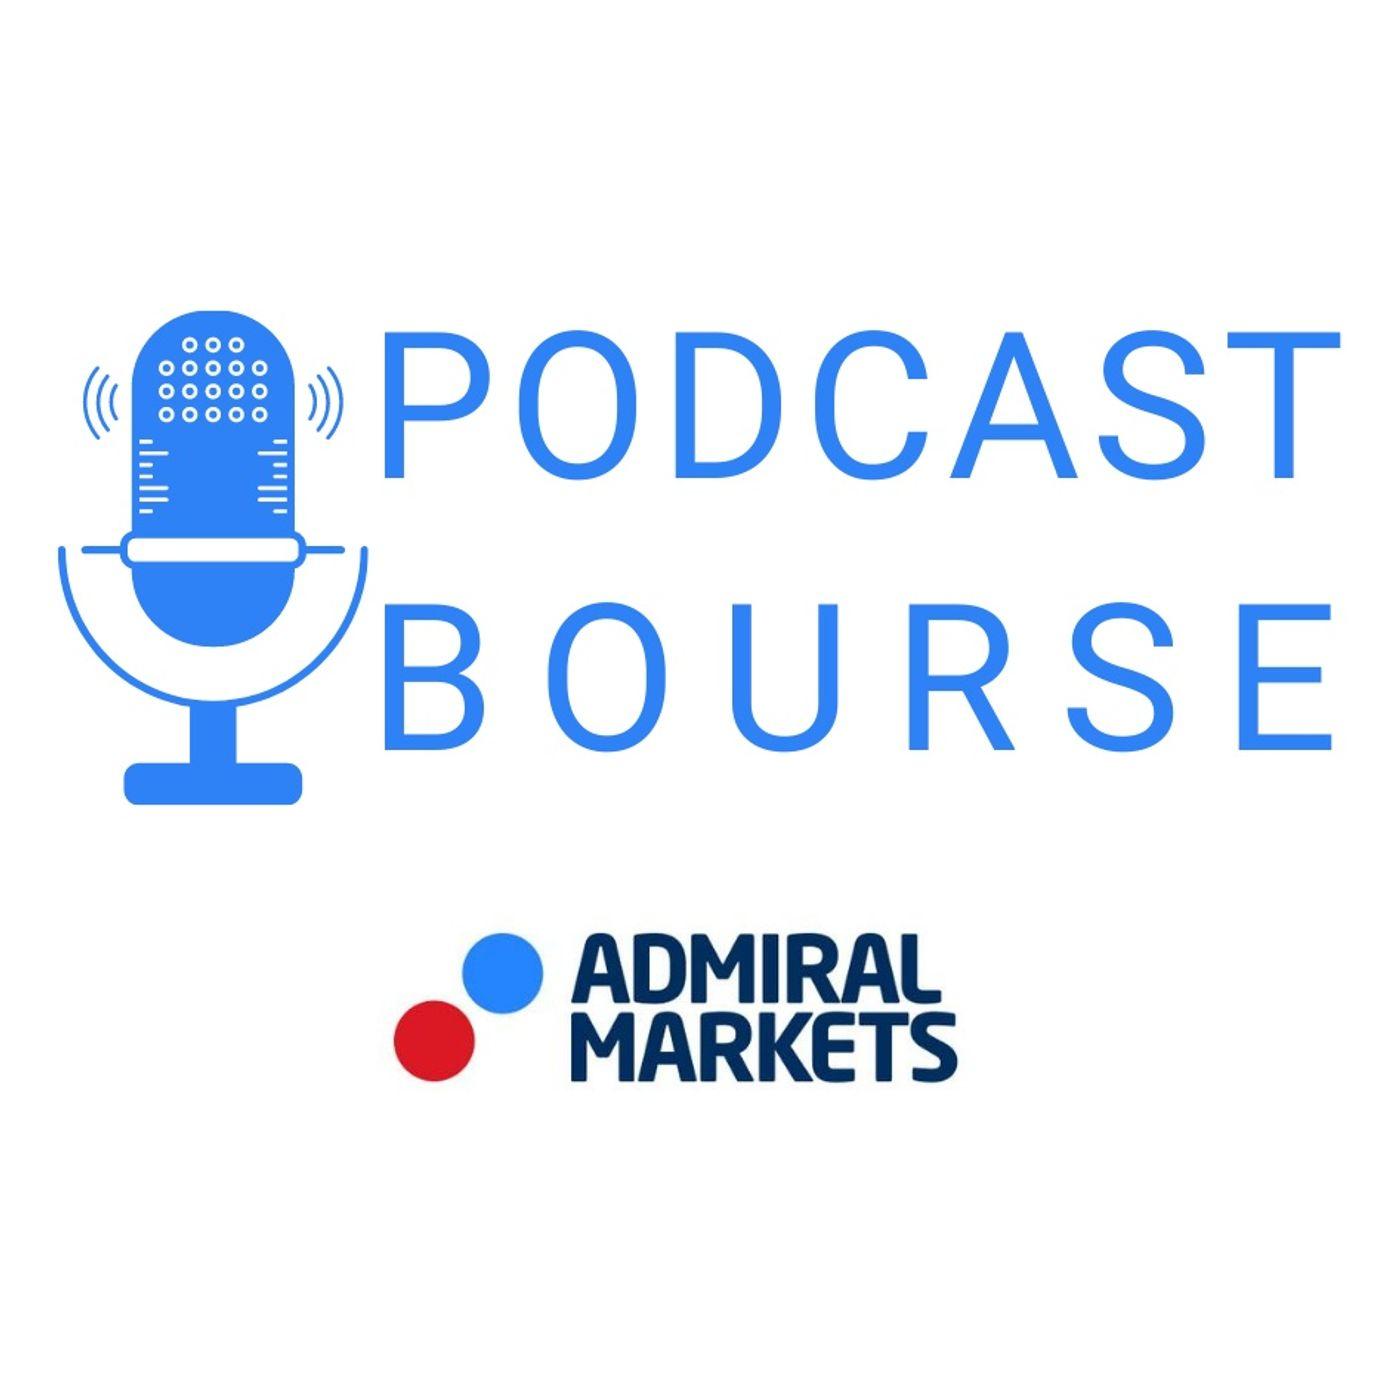 TRADING DÉBUTANT 👉 Apprendre le Trading en 2020